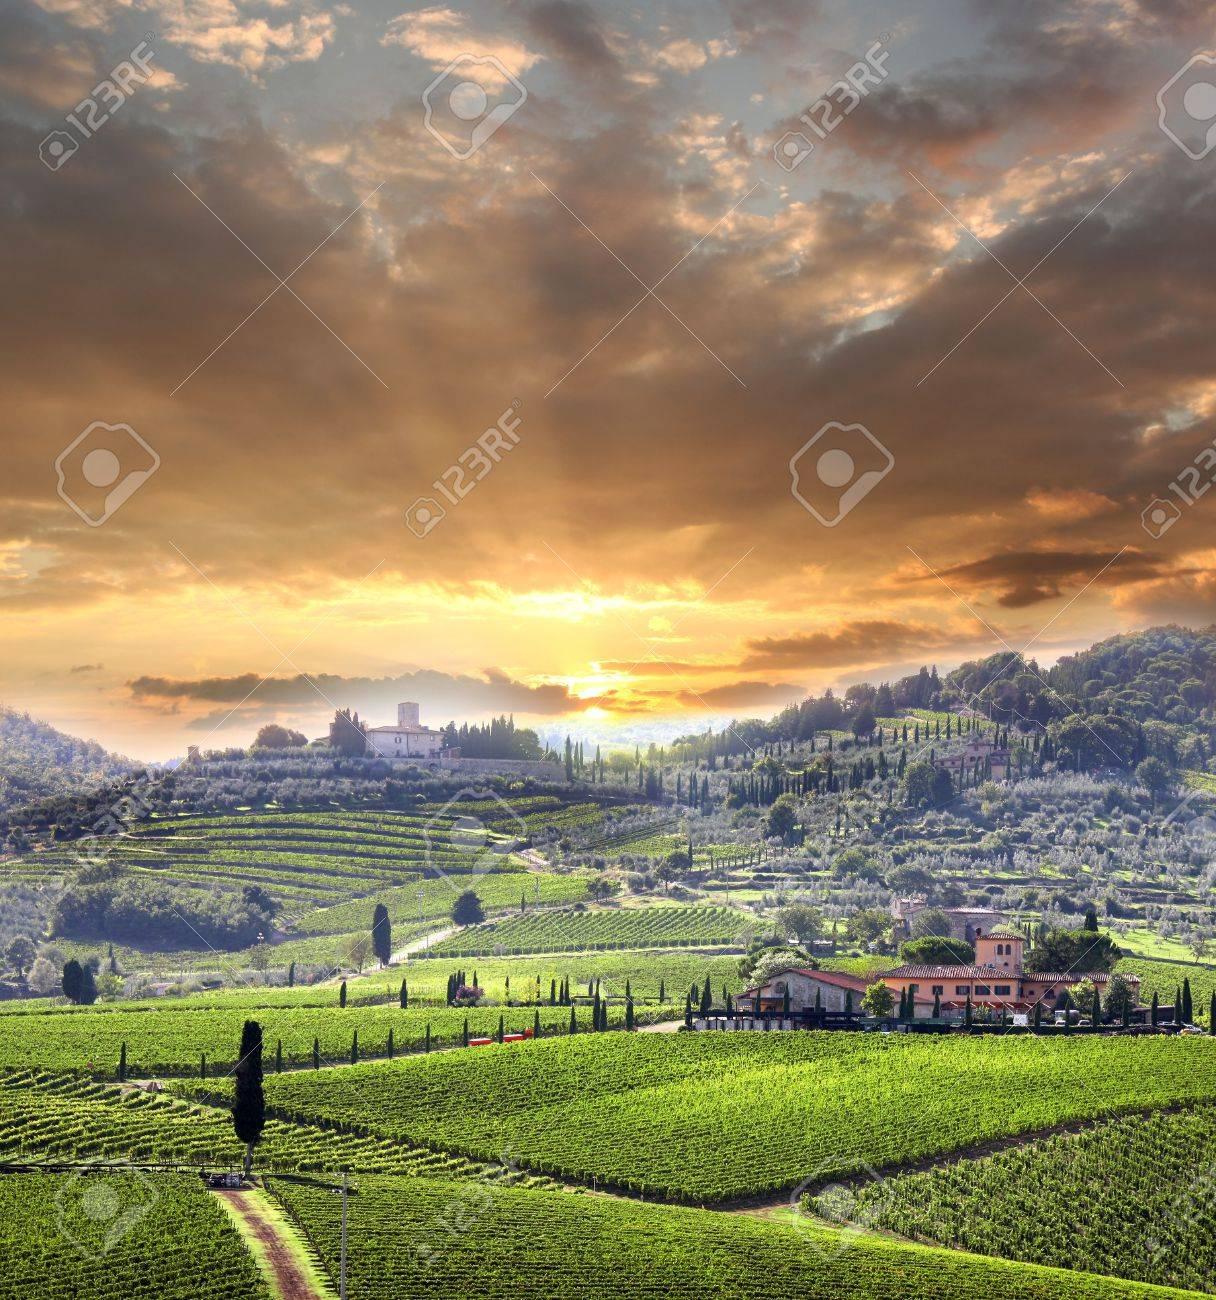 Chianti vineyard landscape in Tuscany, Italy - 17773403